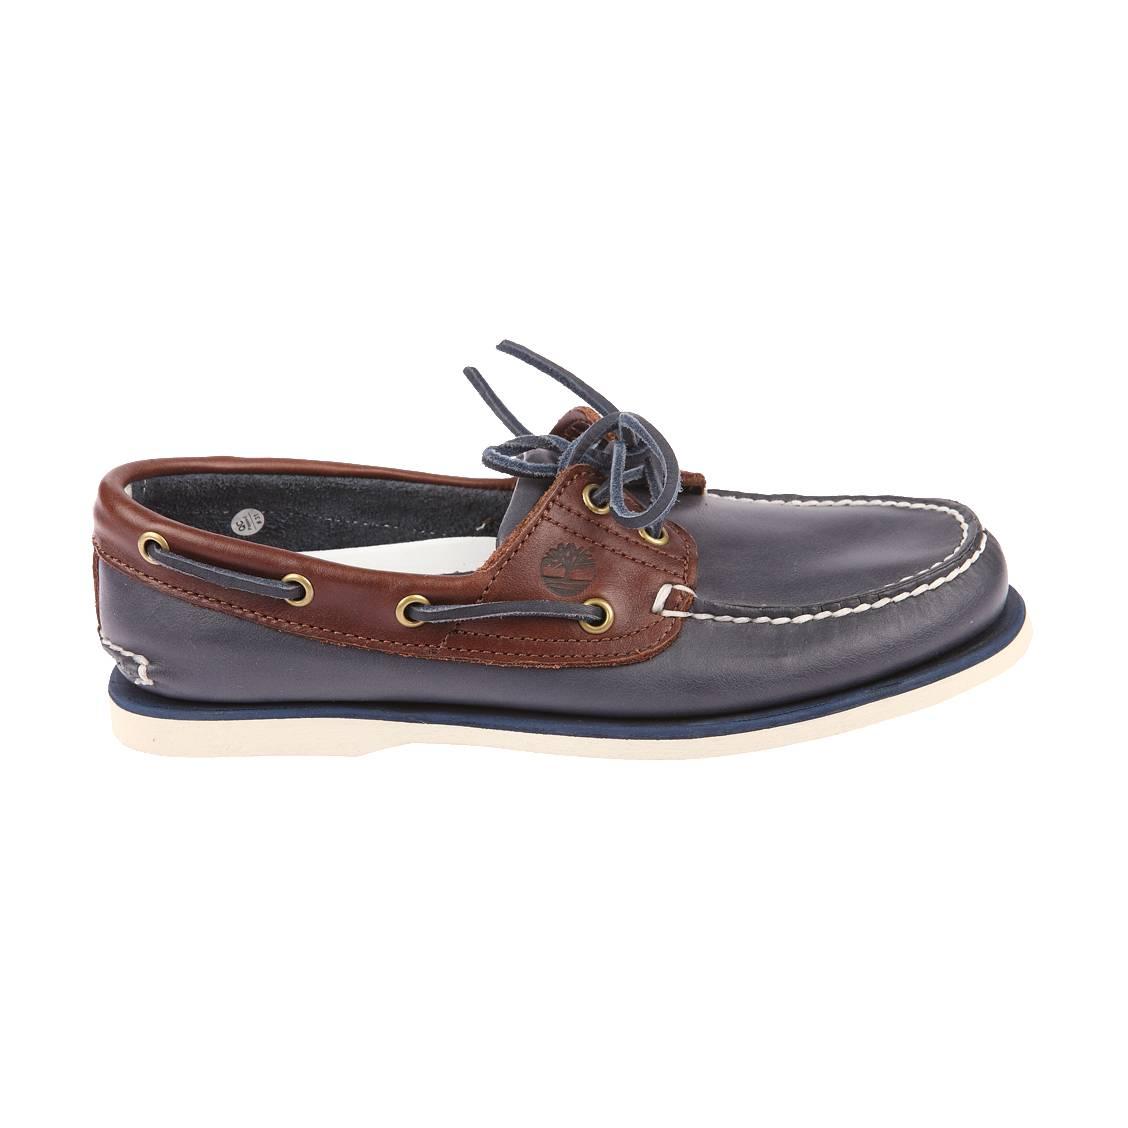 chaussures bateau 2 eye timberland en cuir bleu marine et marron rue des hommes. Black Bedroom Furniture Sets. Home Design Ideas